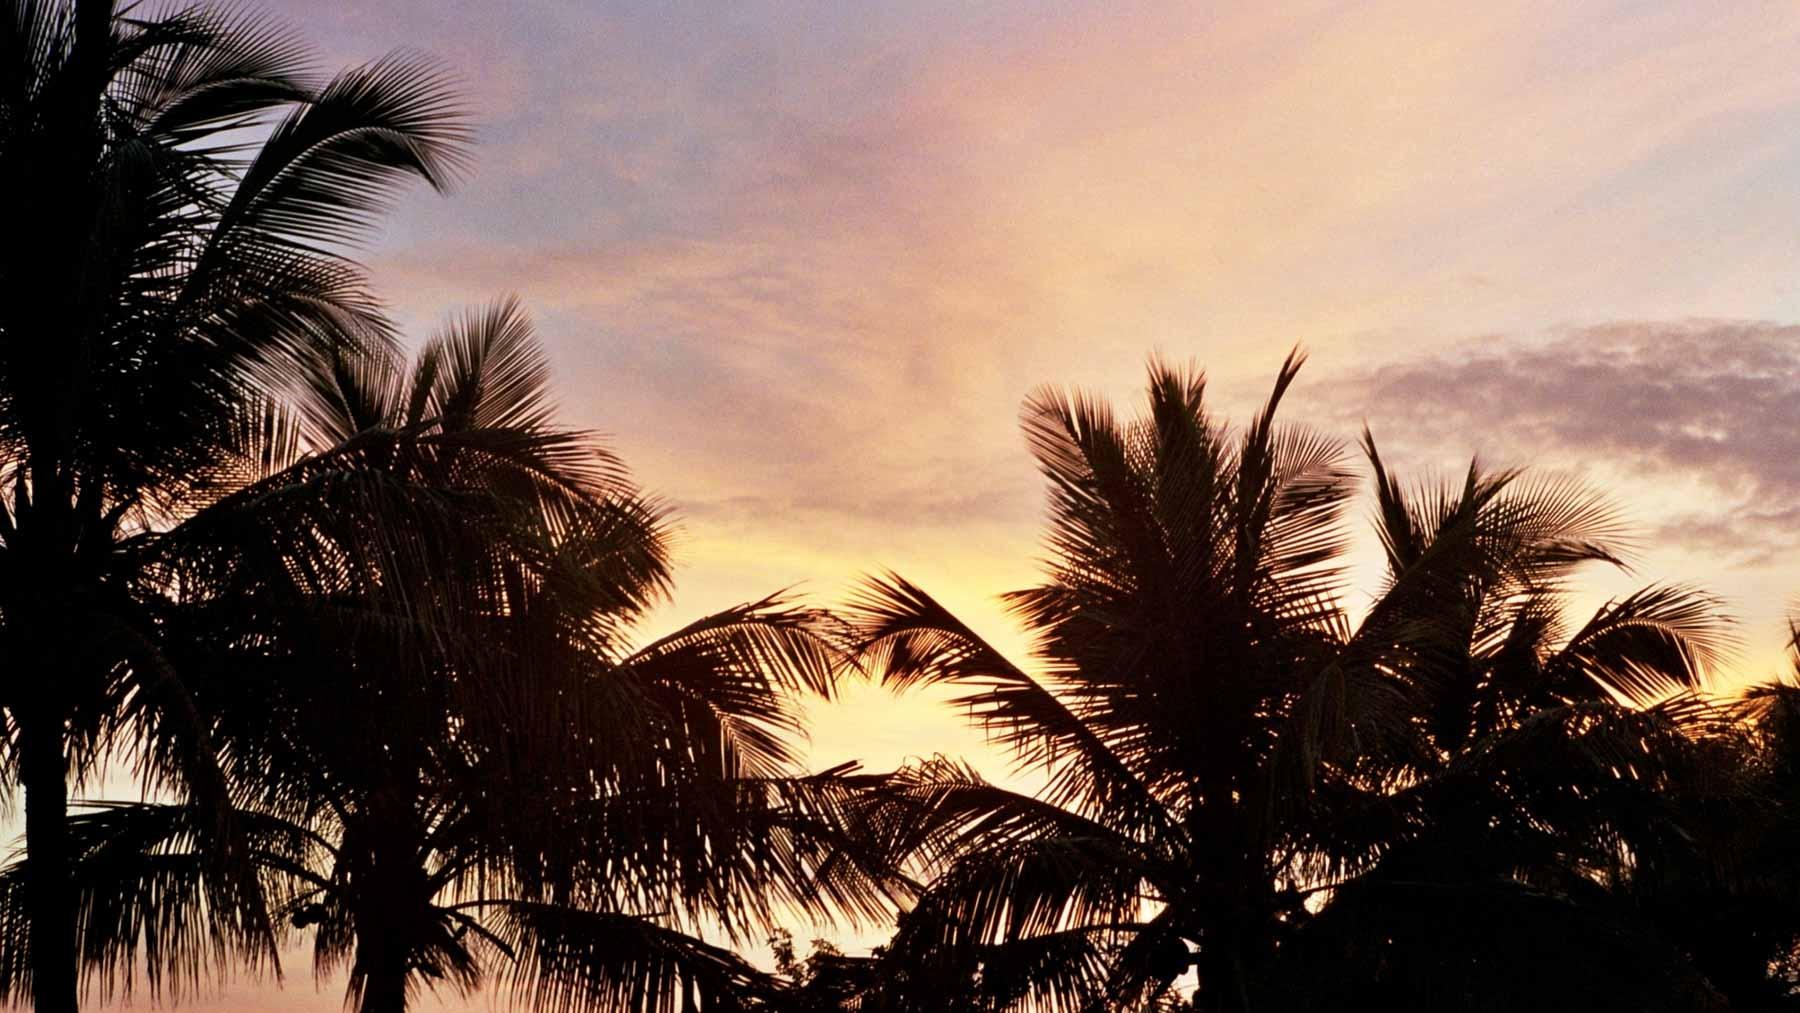 22_KW Sunset.jpg